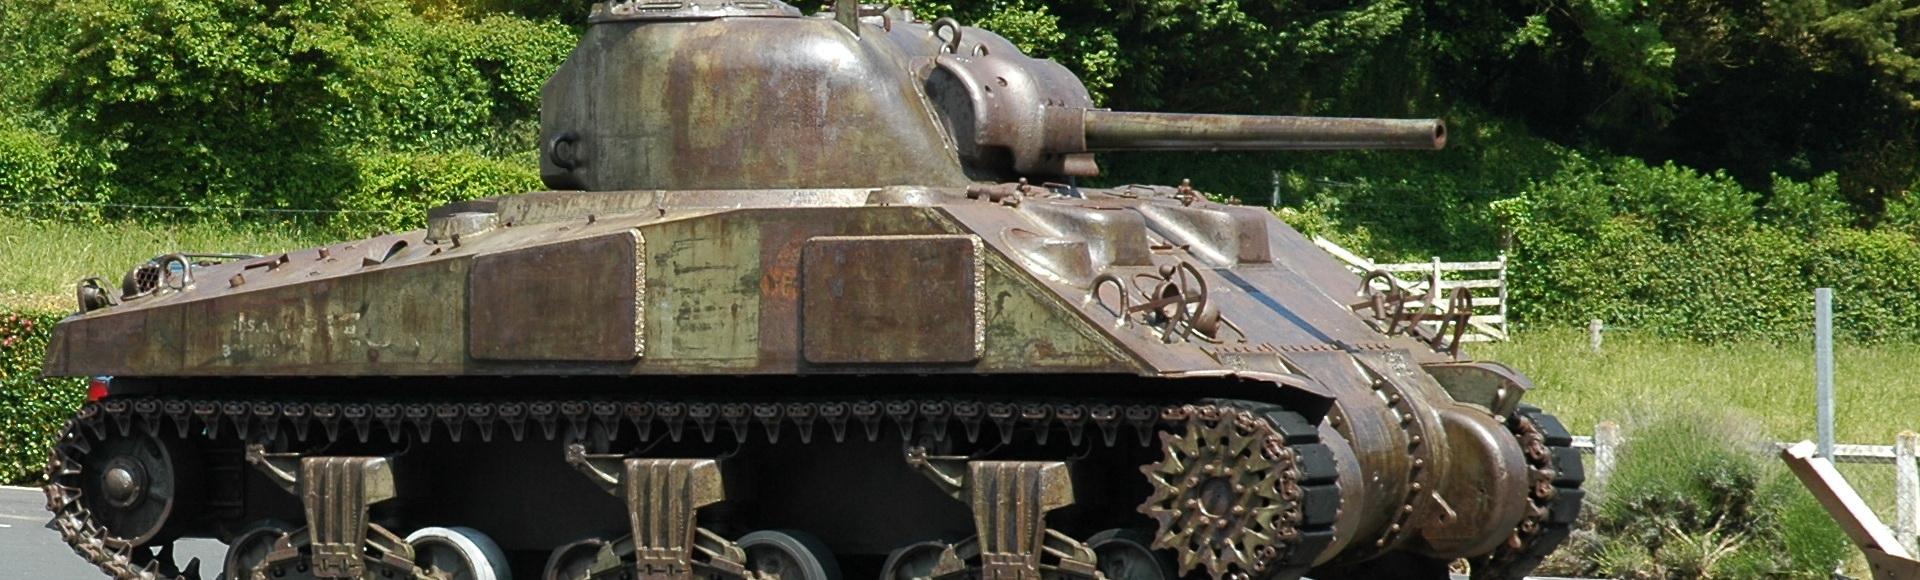 WW2 monuments